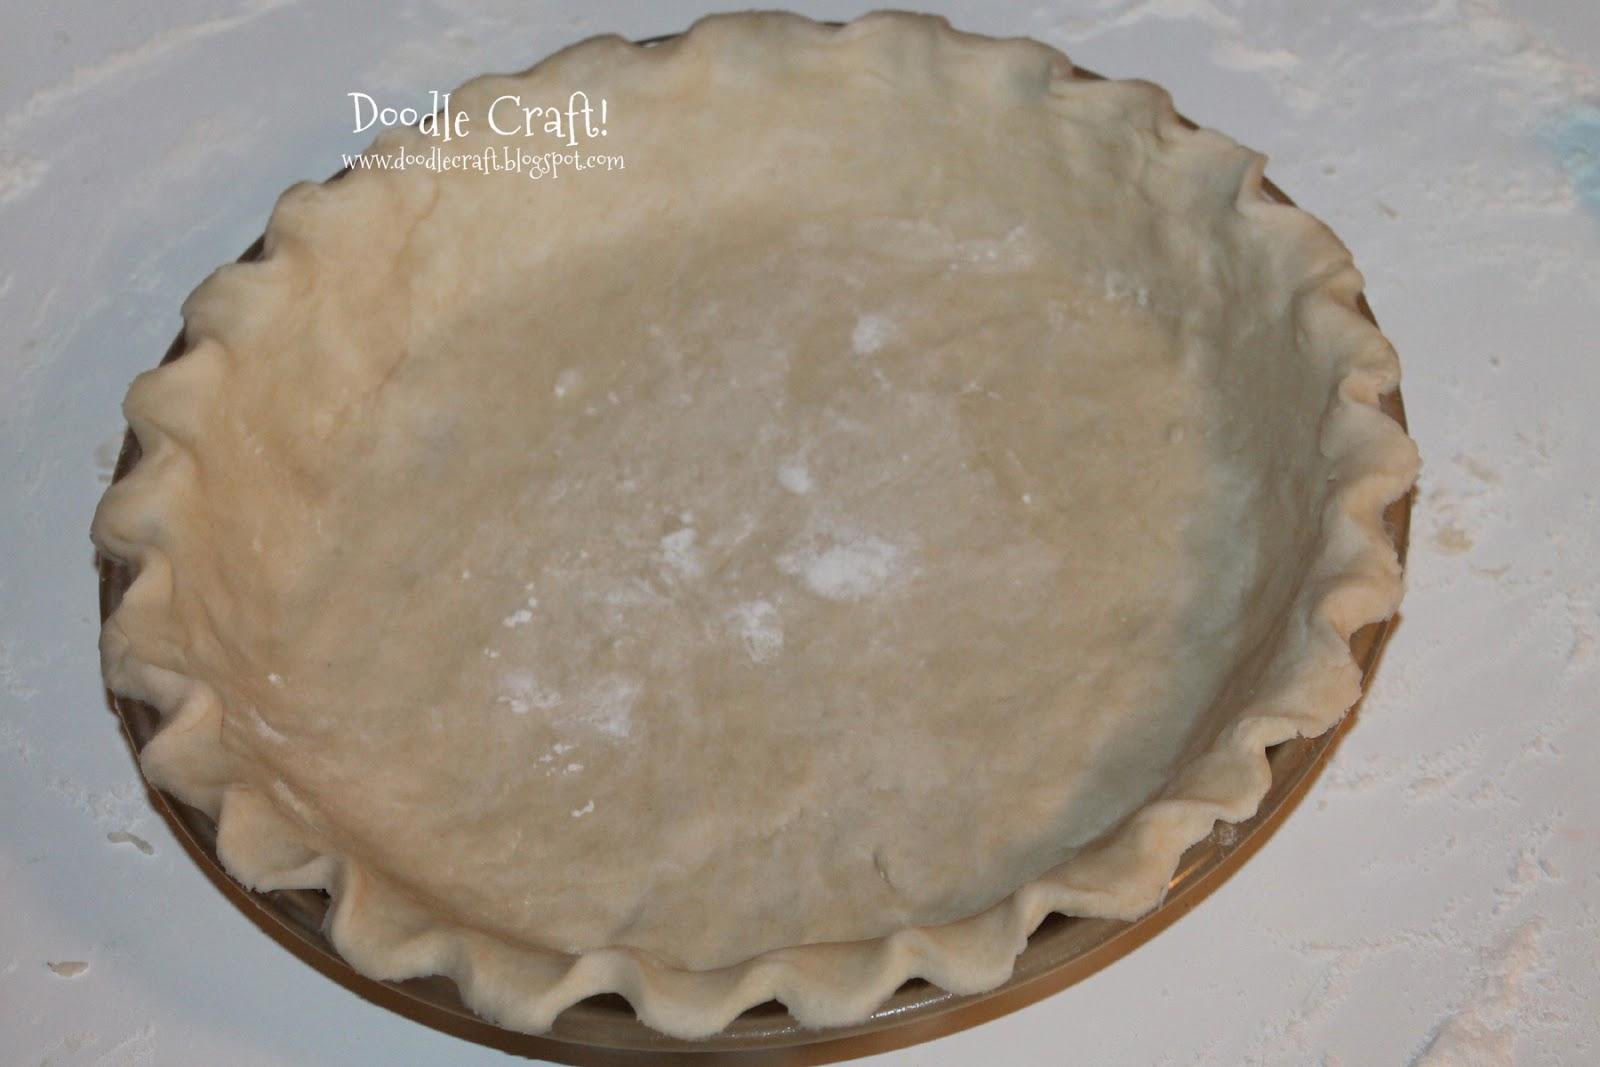 Doodlecraft Pie Crust